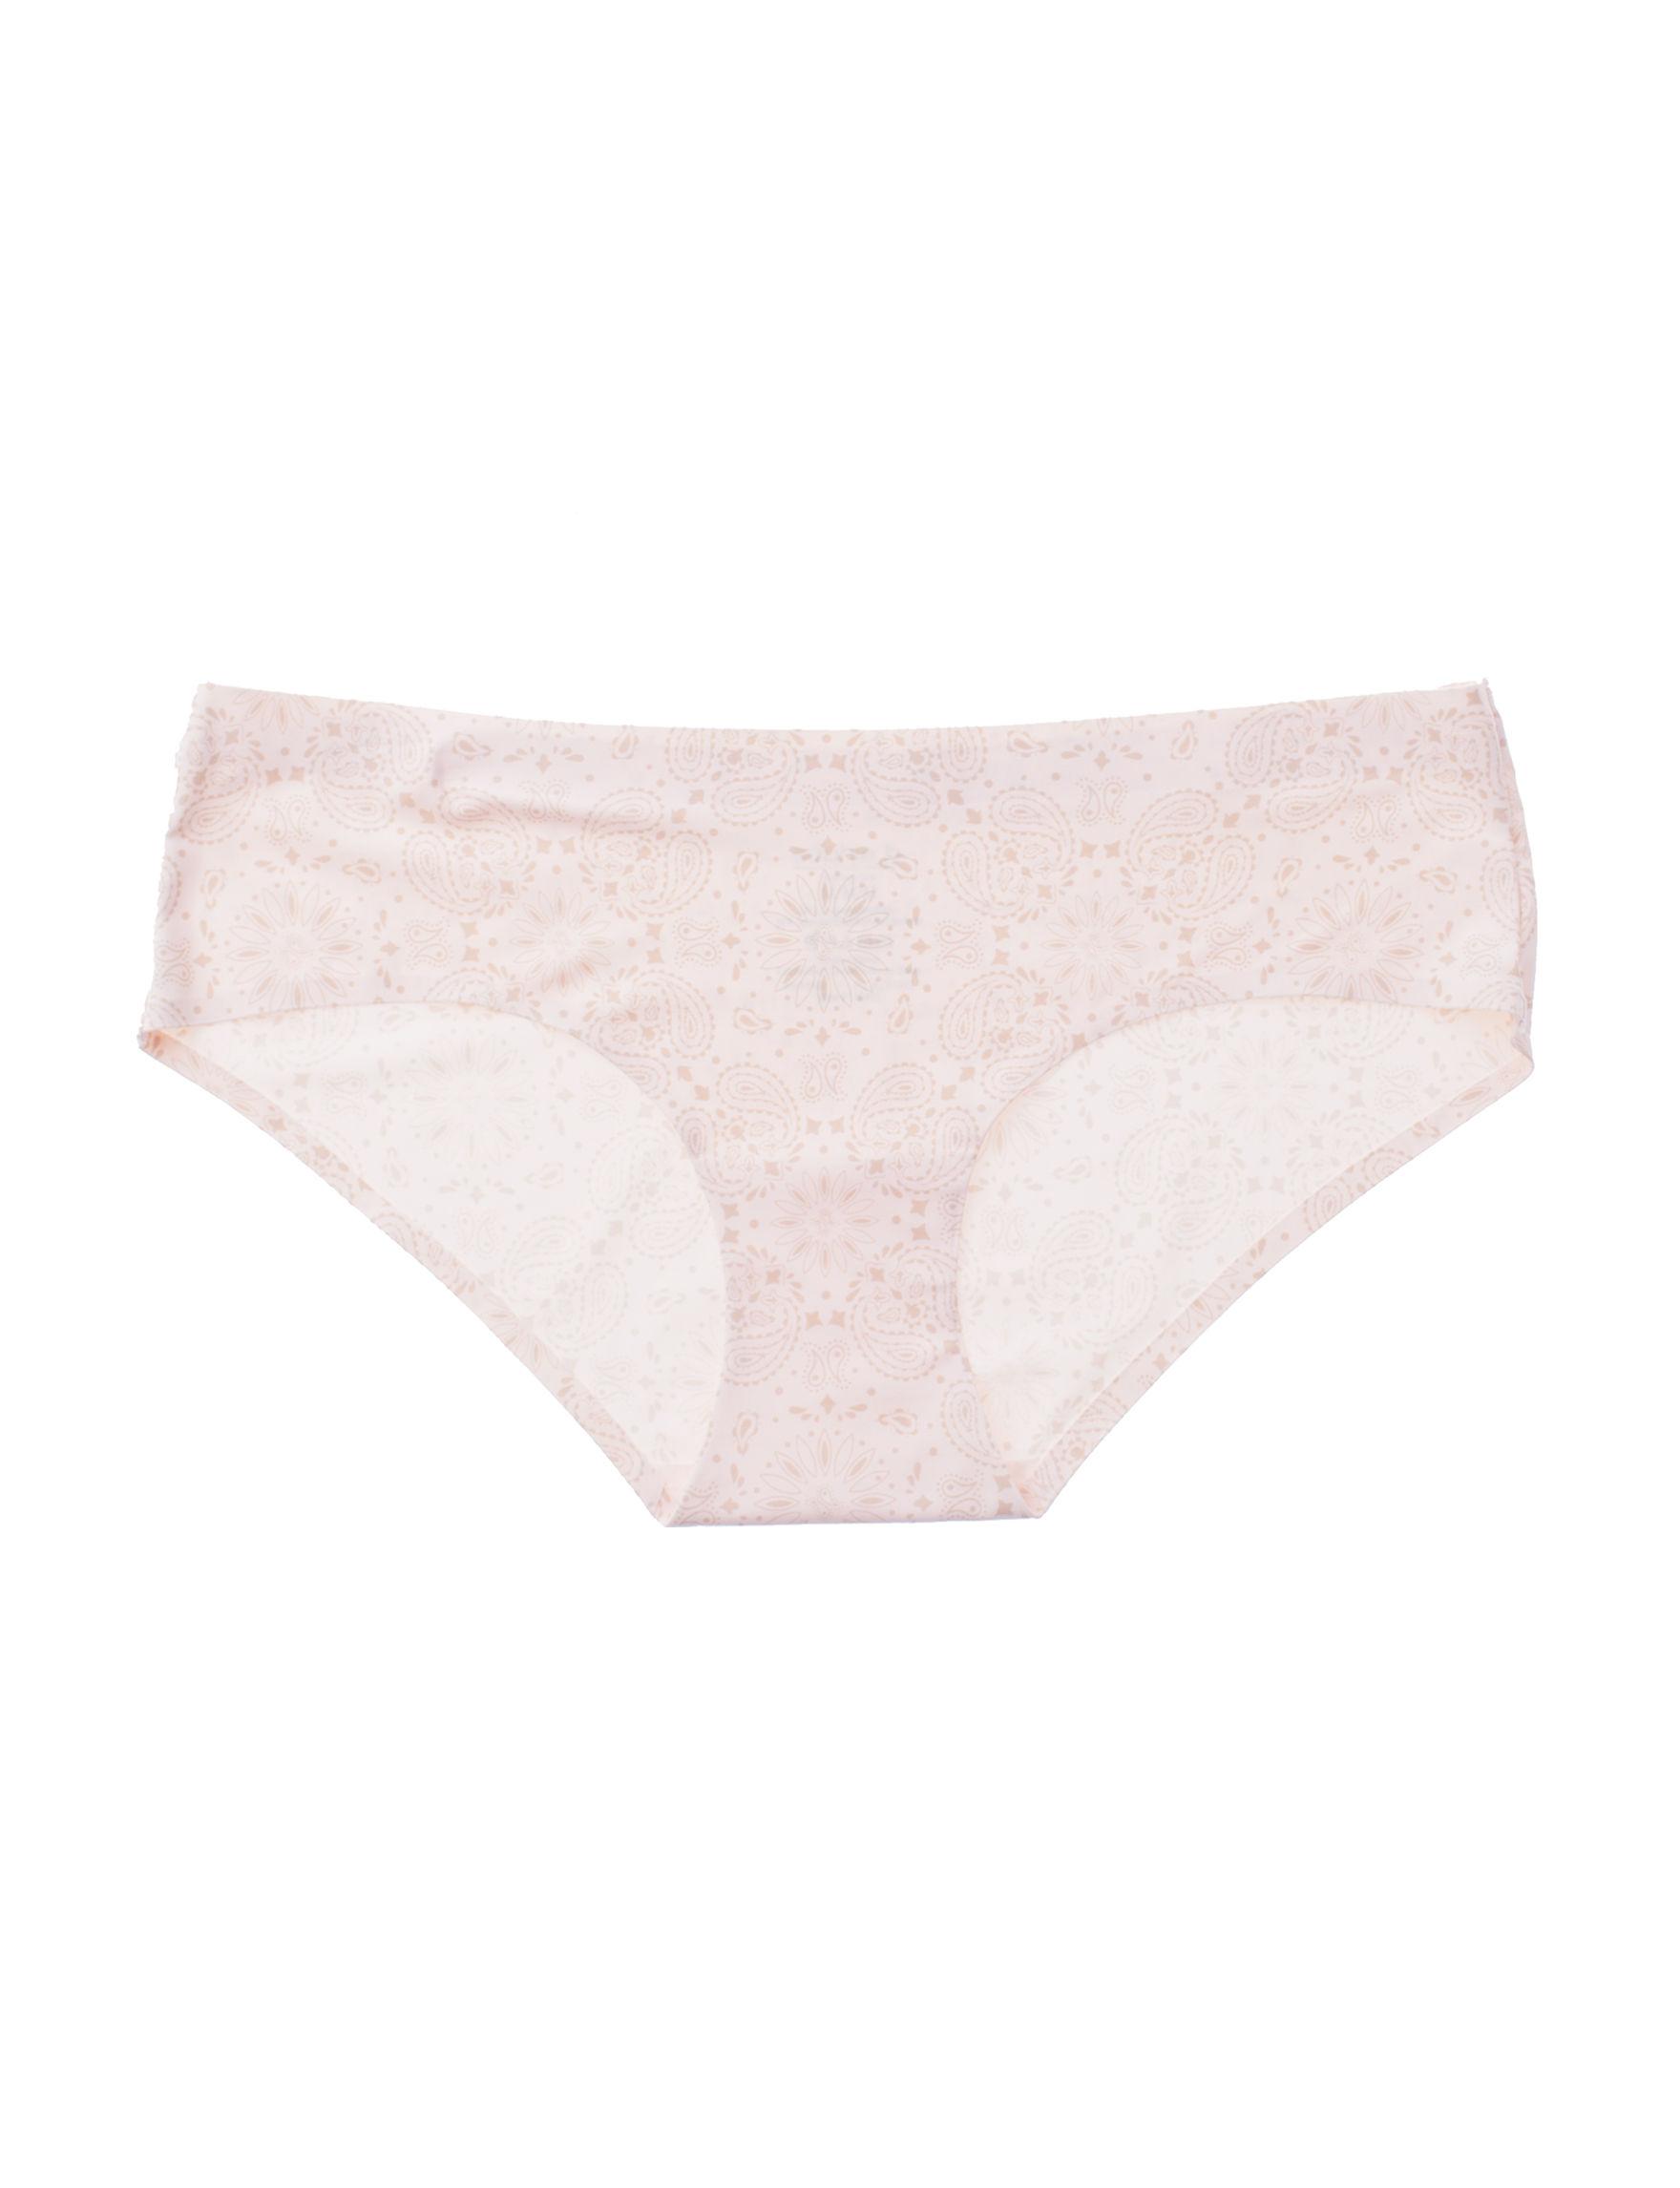 Sophie B Pink Panties Hipster